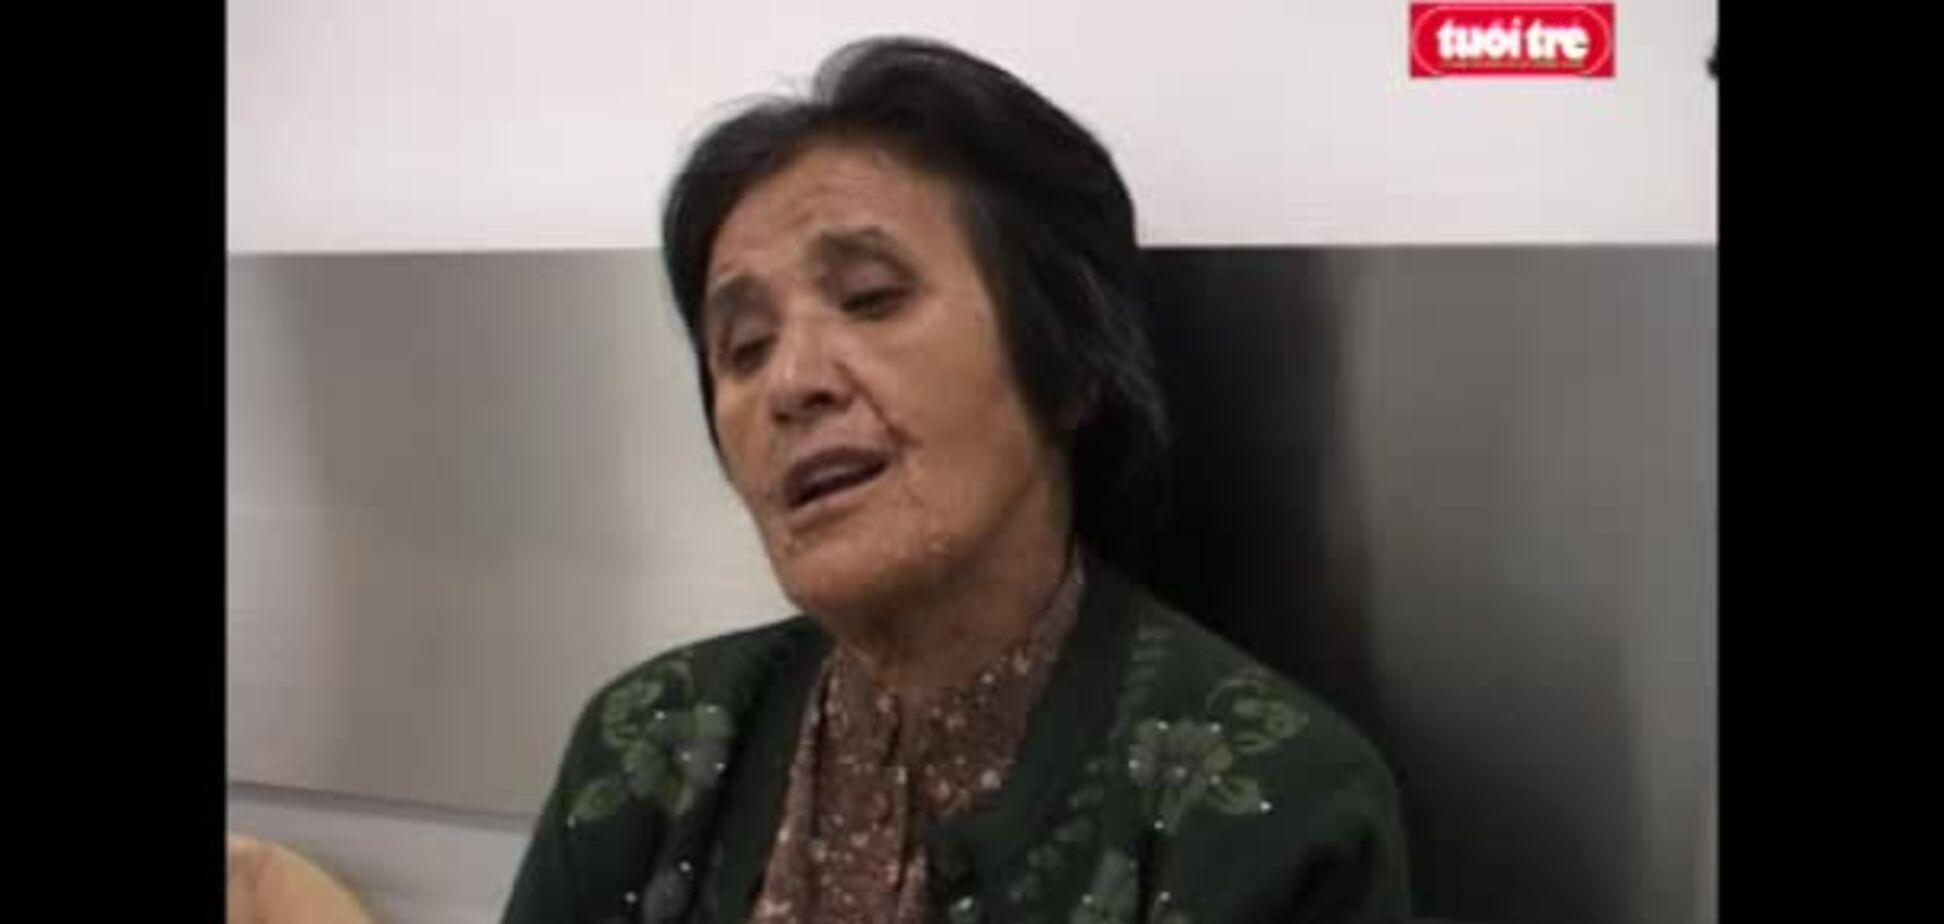 Вьетнамцу удалили опухоль весом 90 килограммов